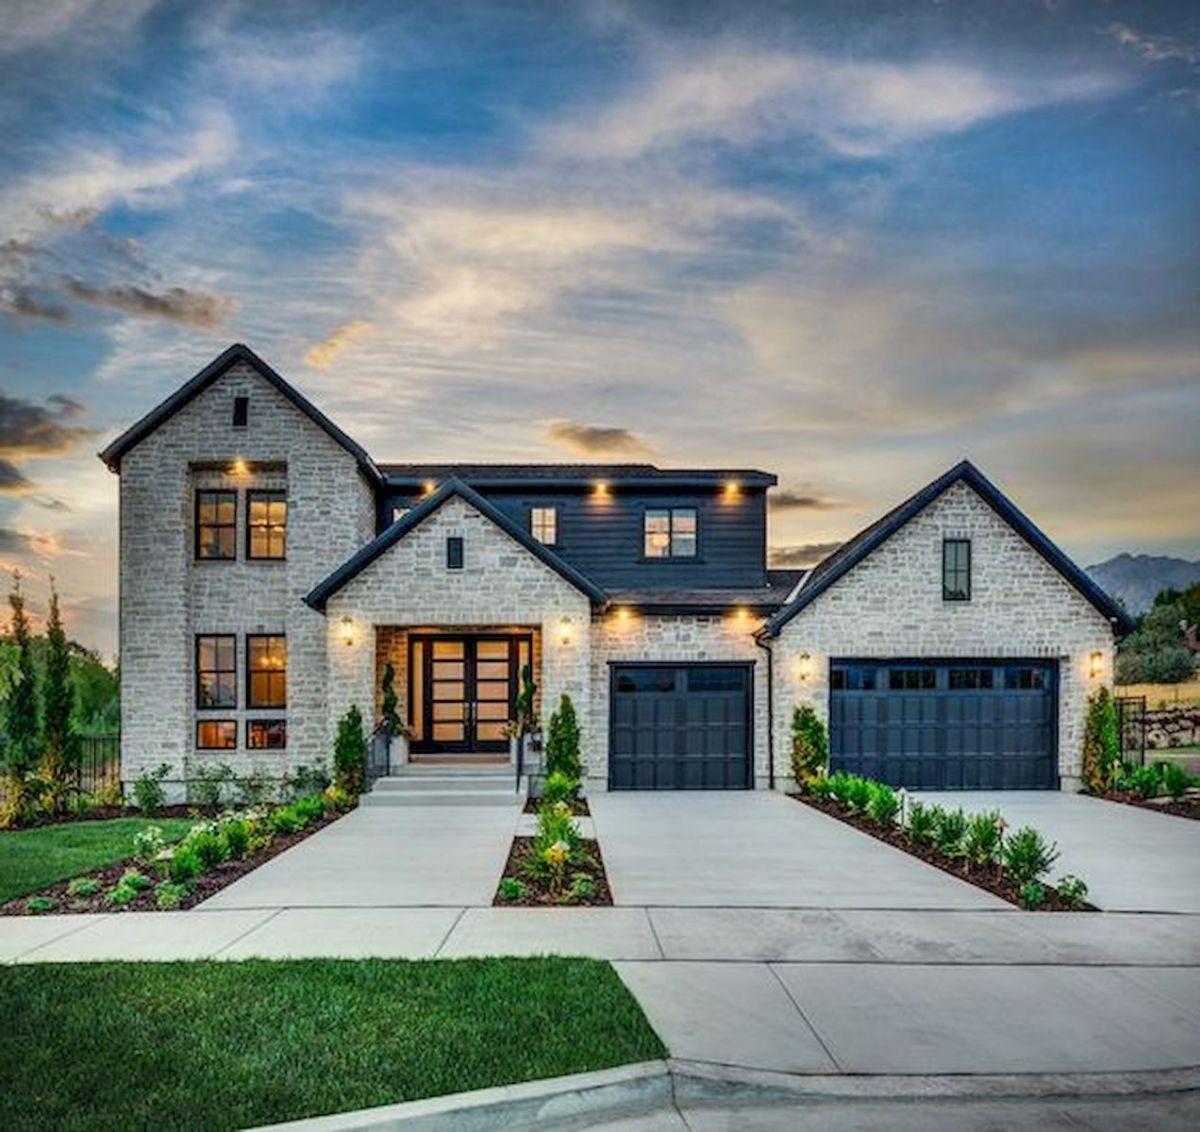 33 Beautiful Modern Farmhouse Exterior Design Ideas 1   33DECOR   Modern farmhouse exterior ...